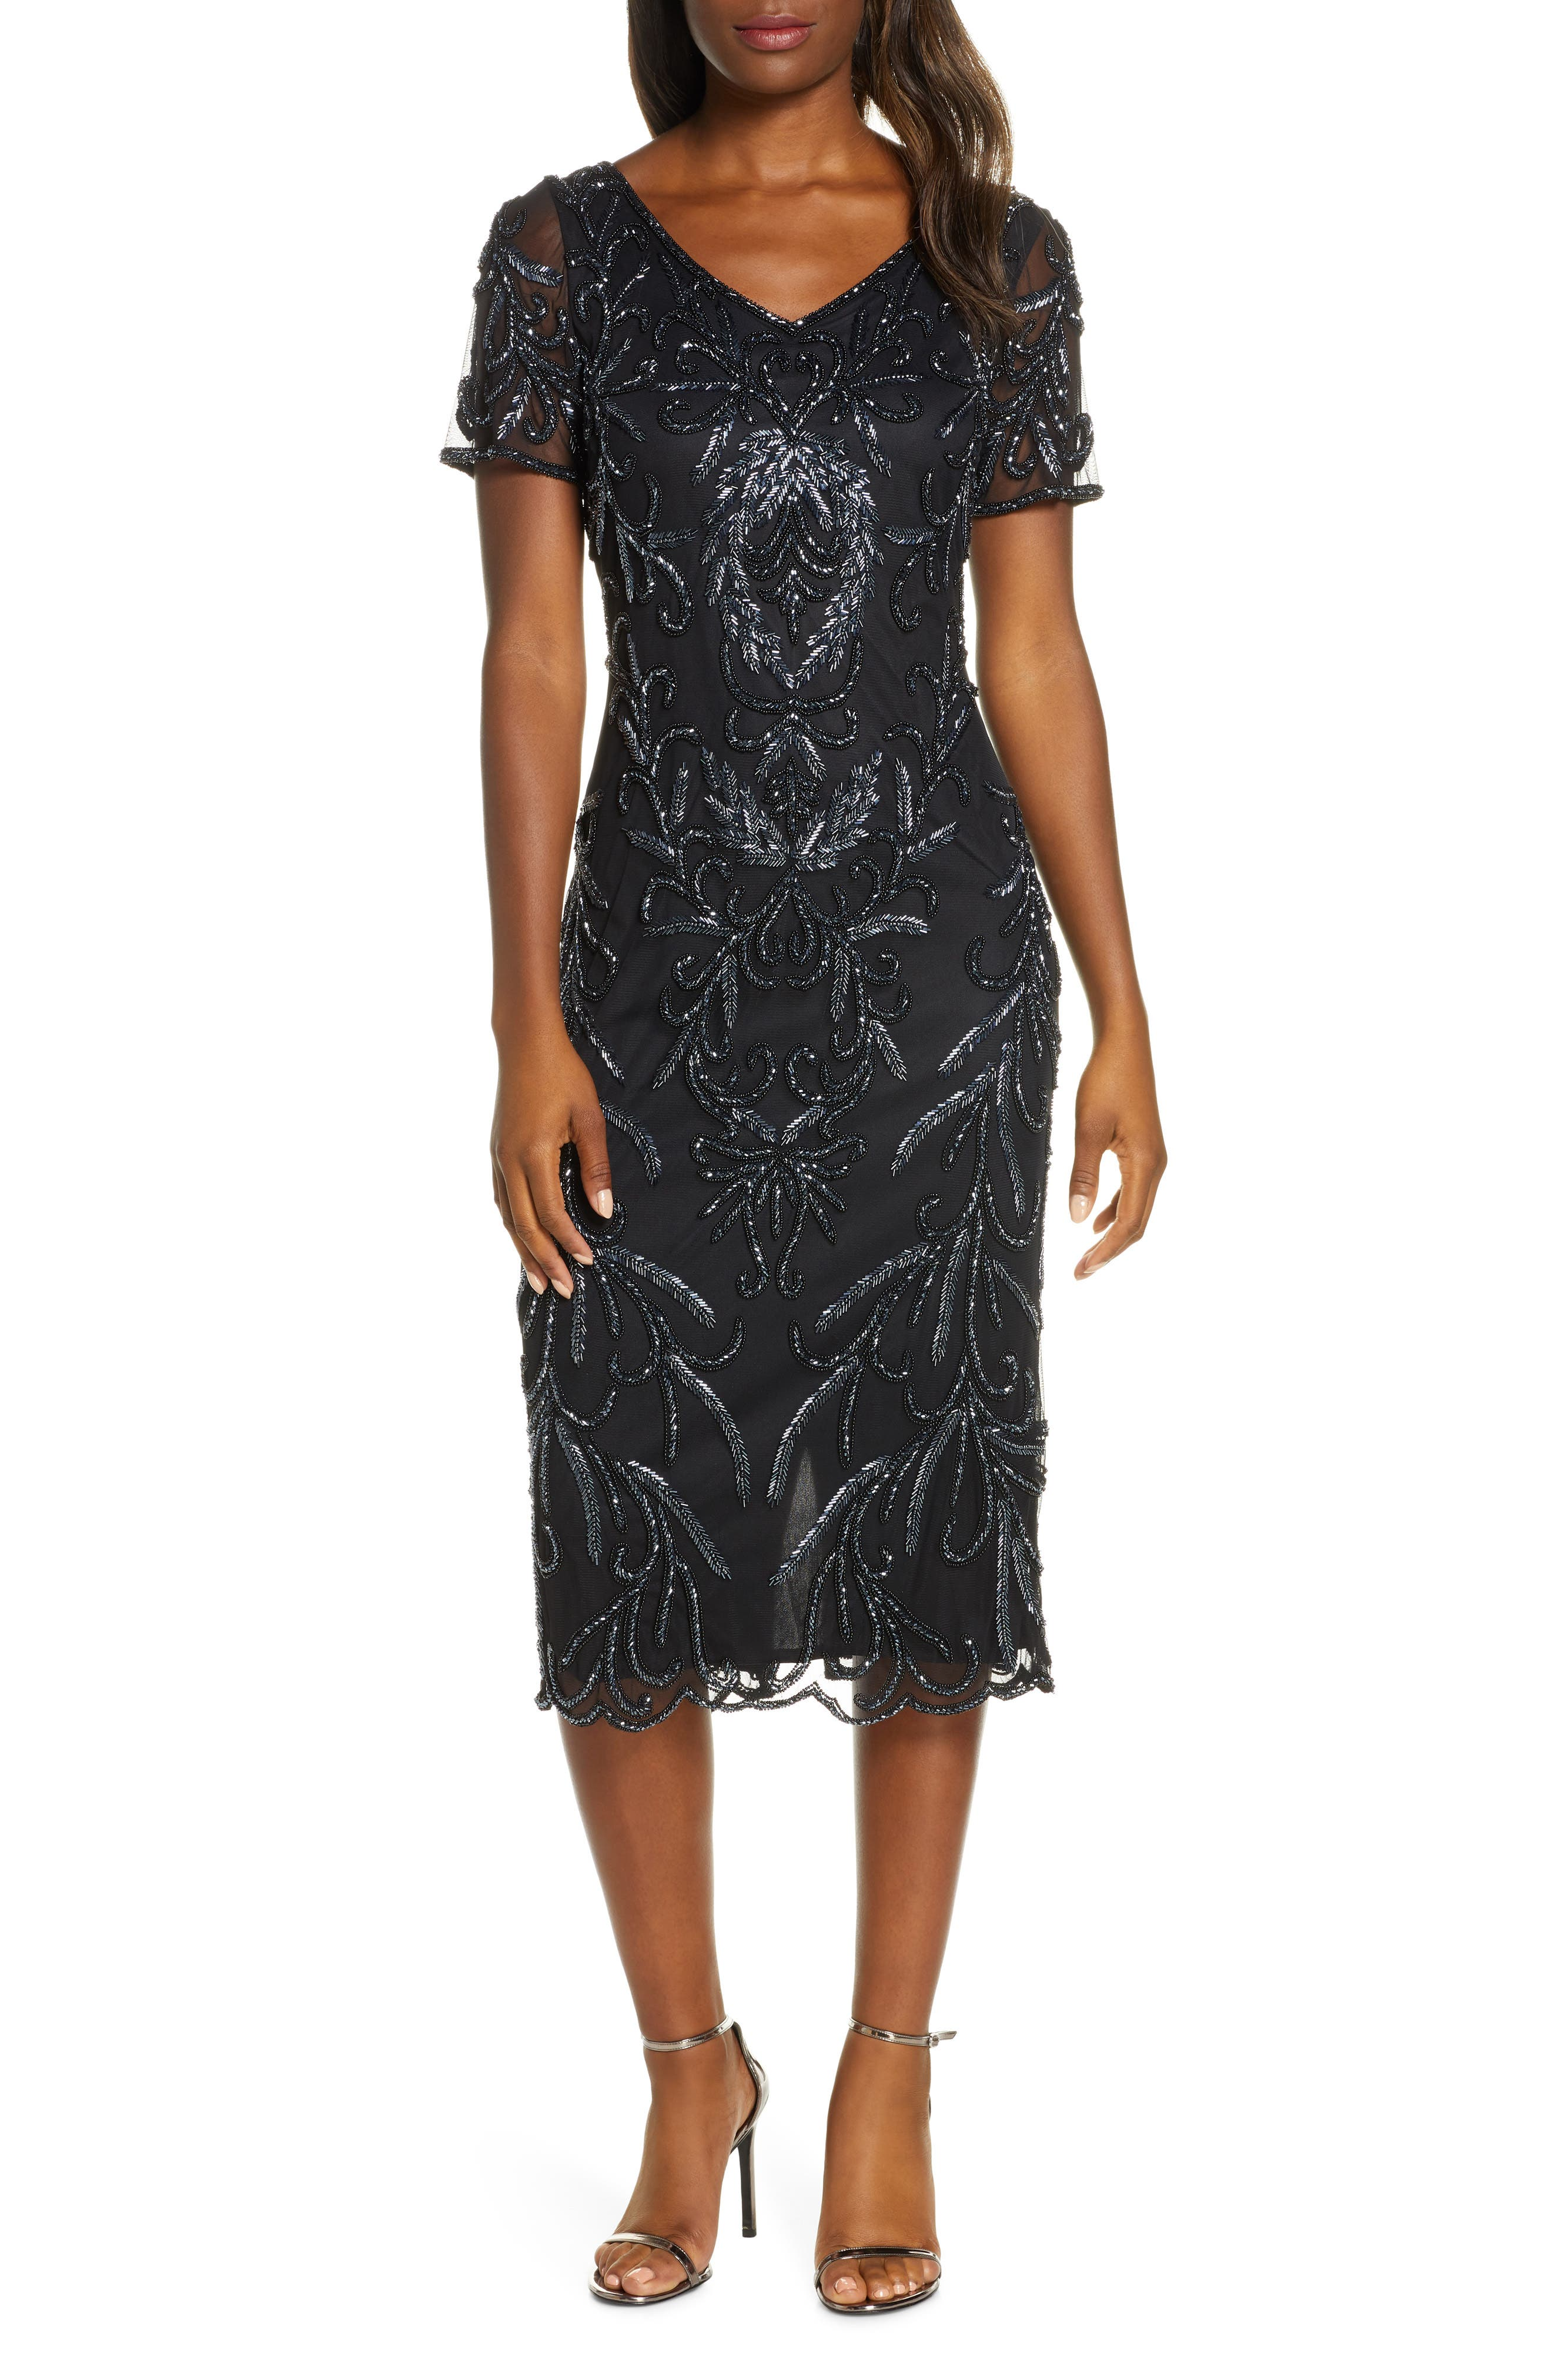 Vintage 1920s Dresses – Where to Buy Womens Pisarro Nights Beaded Midi Dress $218.00 AT vintagedancer.com